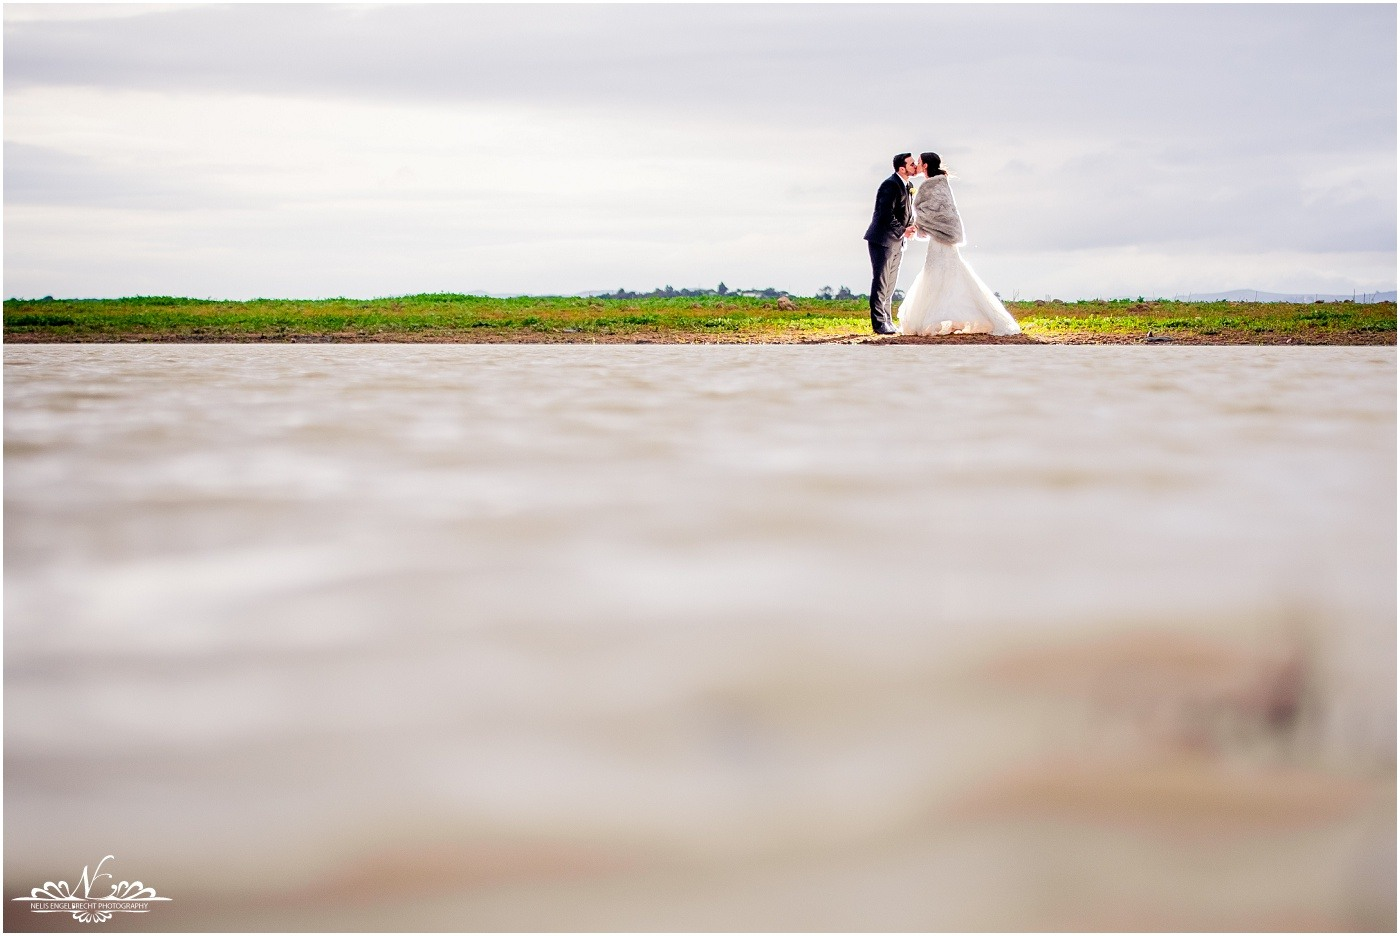 Eensgezind-Wedding-Photos-Nelis-Engelbrecht-Photography-157